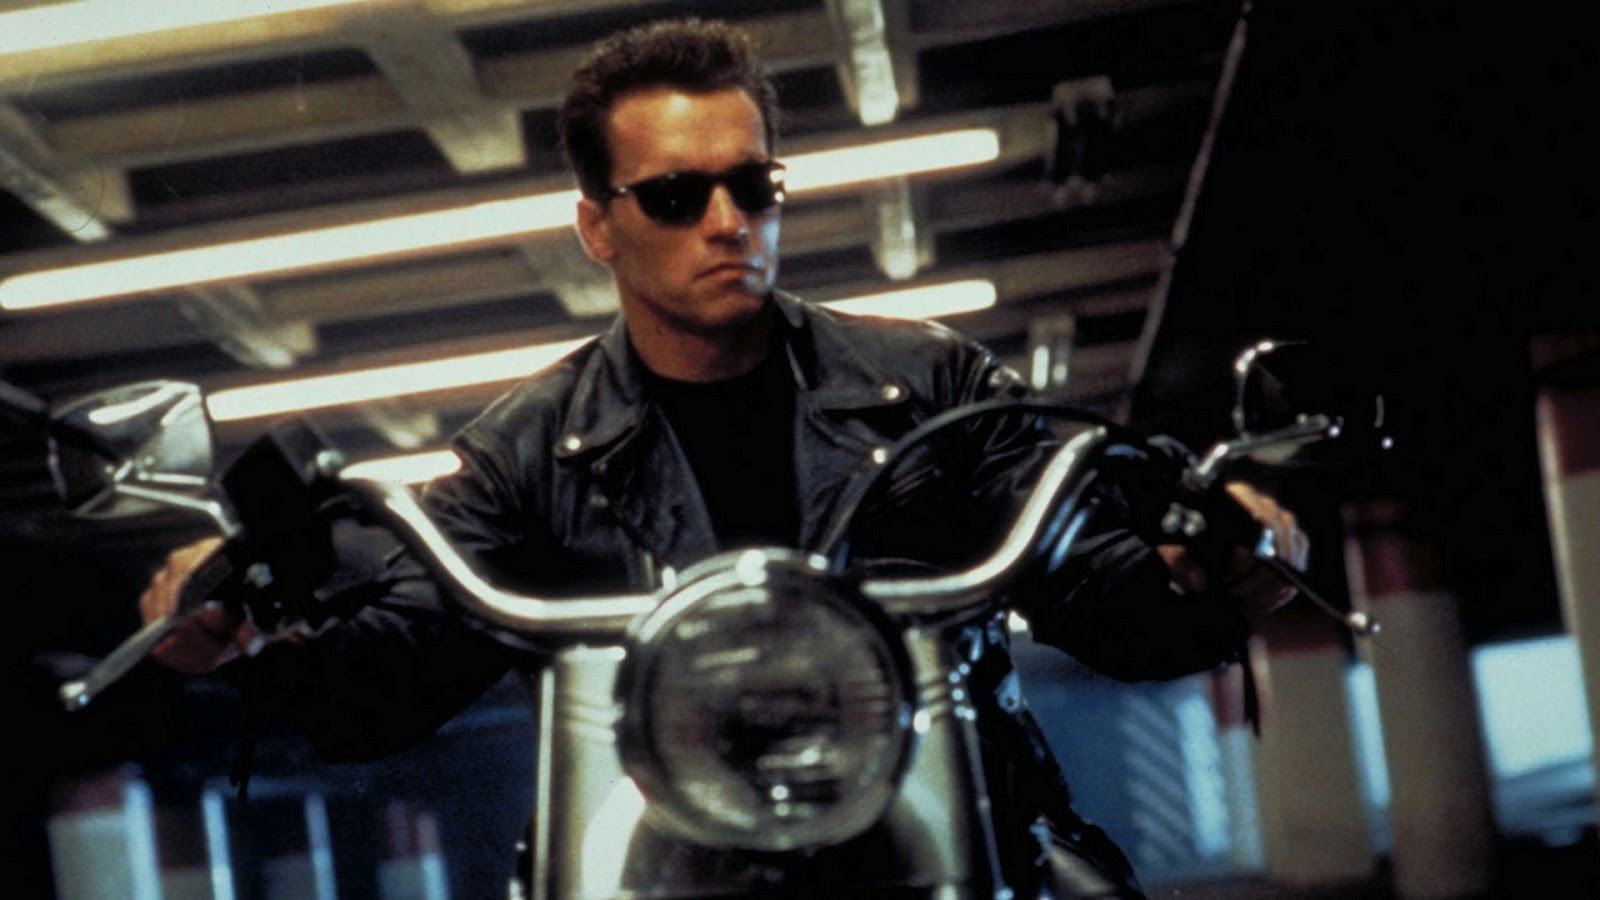 http://4.bp.blogspot.com/-izqeBhocrJQ/UBKhDYxGFEI/AAAAAAAAC-0/I5h56wO2yxQ/s1600/Terminator-2-Judgment-Day-Wallpaper-5.jpg